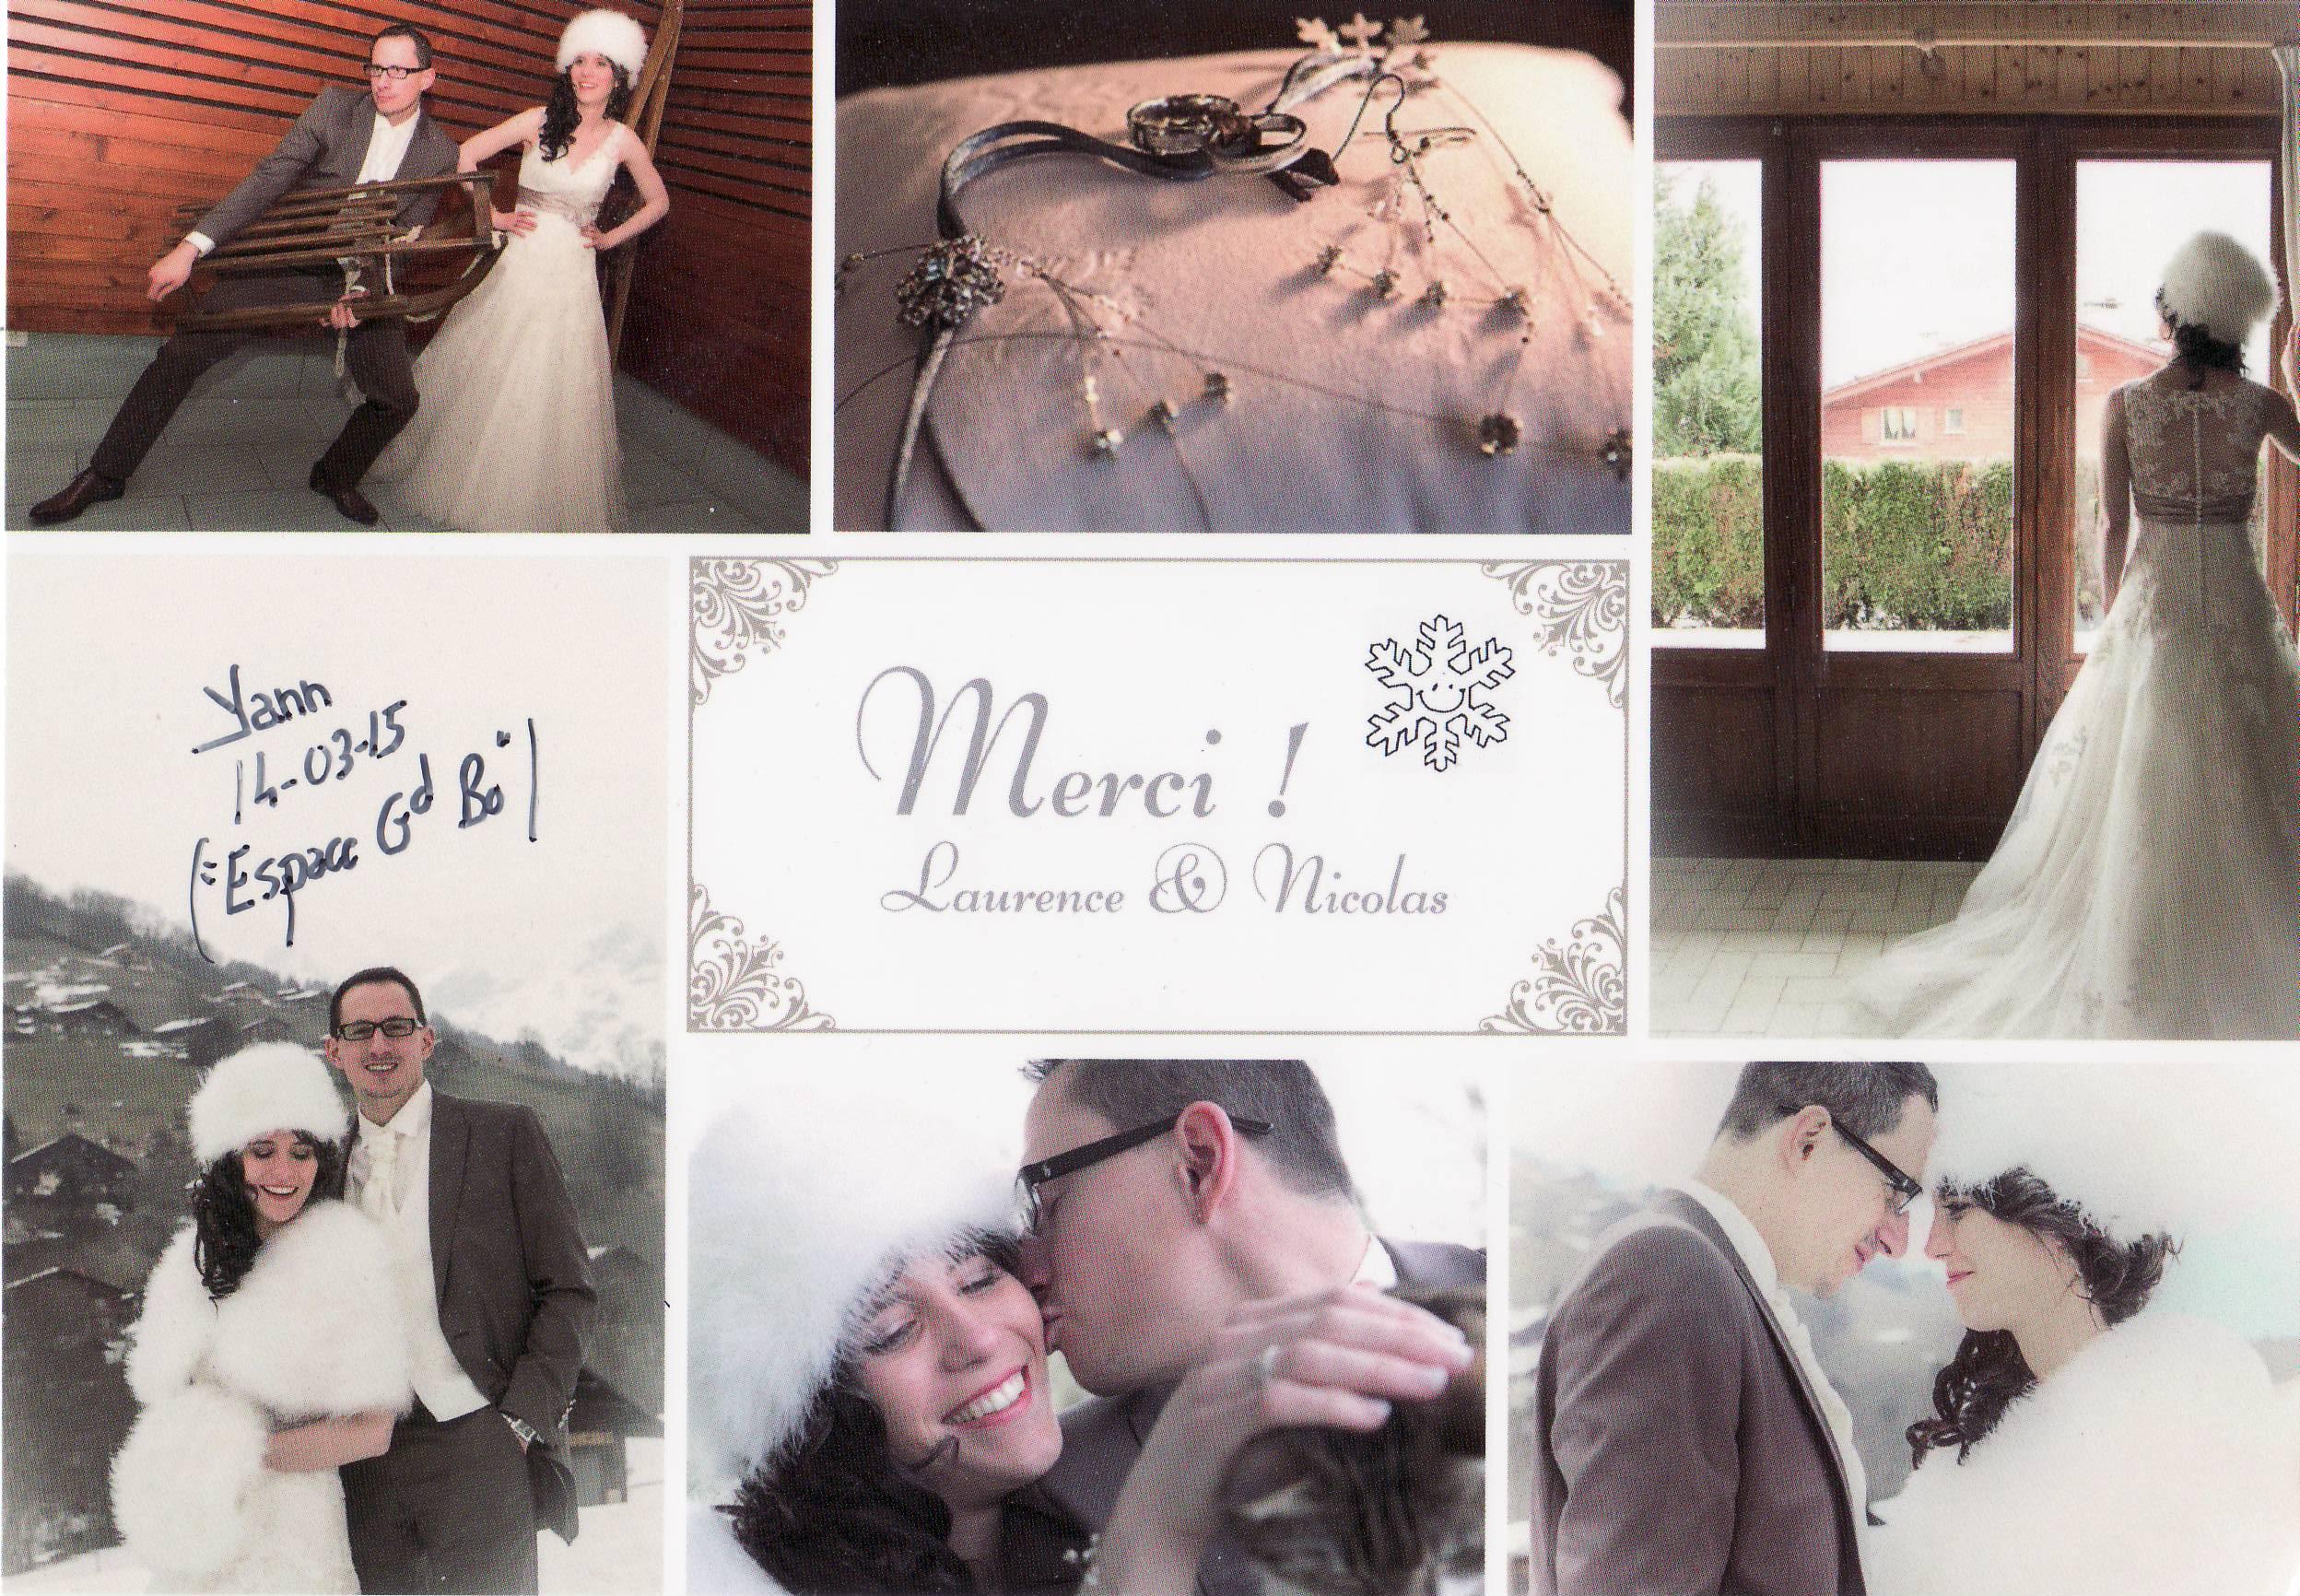 Mariage BRUNBROUCK Nicolas & Laurence (Espace Grand bo Grand Bornand) (14-03-201